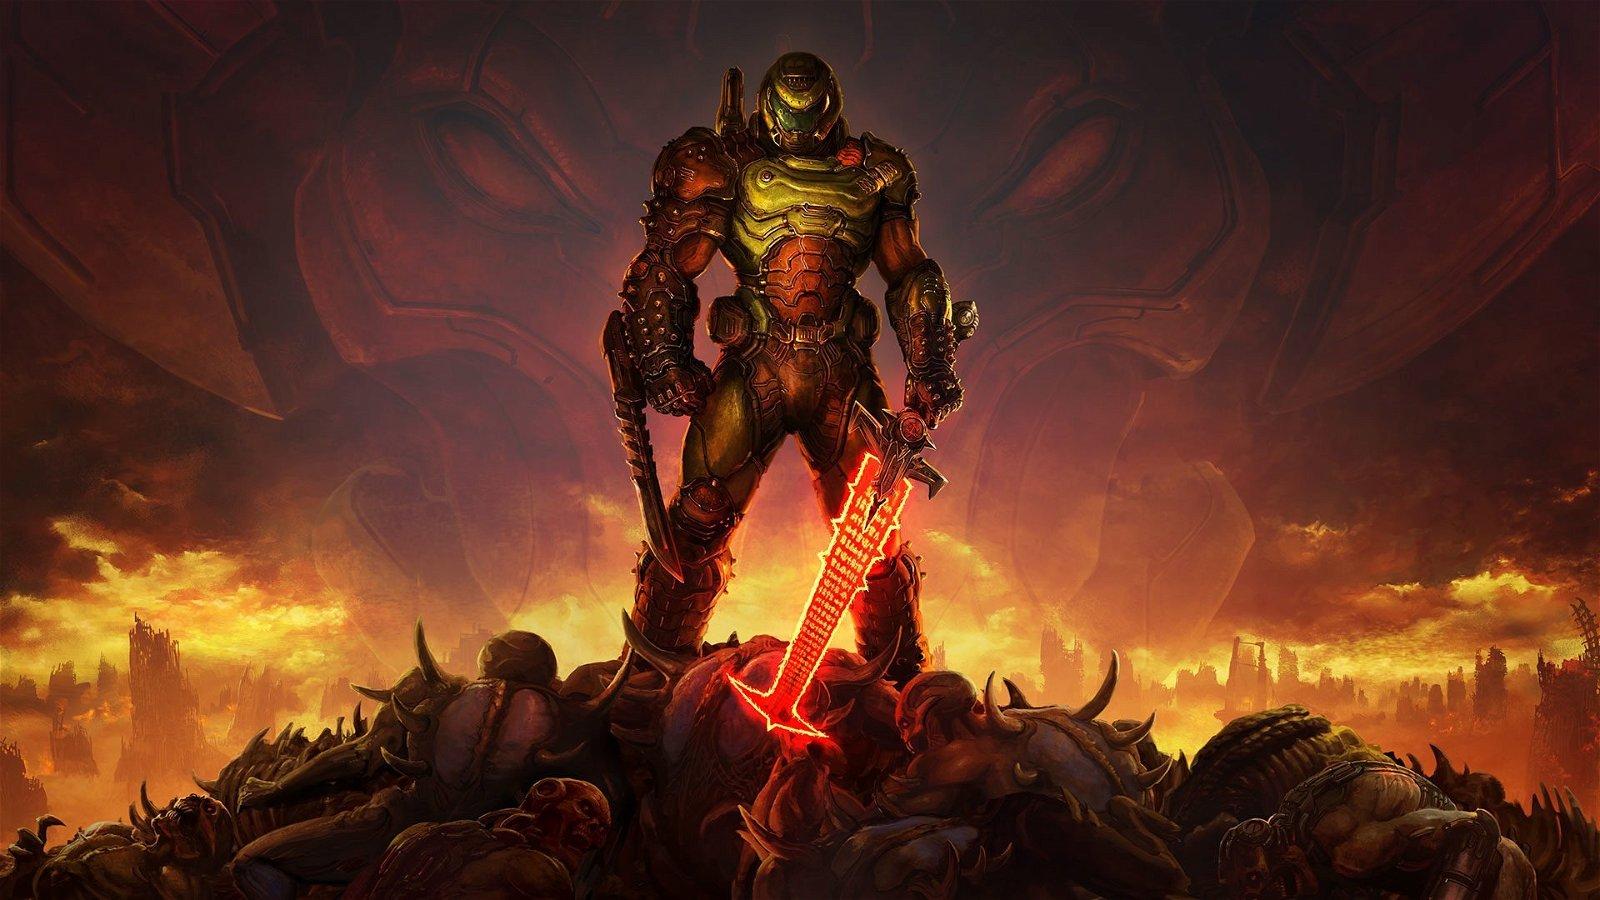 Black Friday 2020: Best Gaming Deals